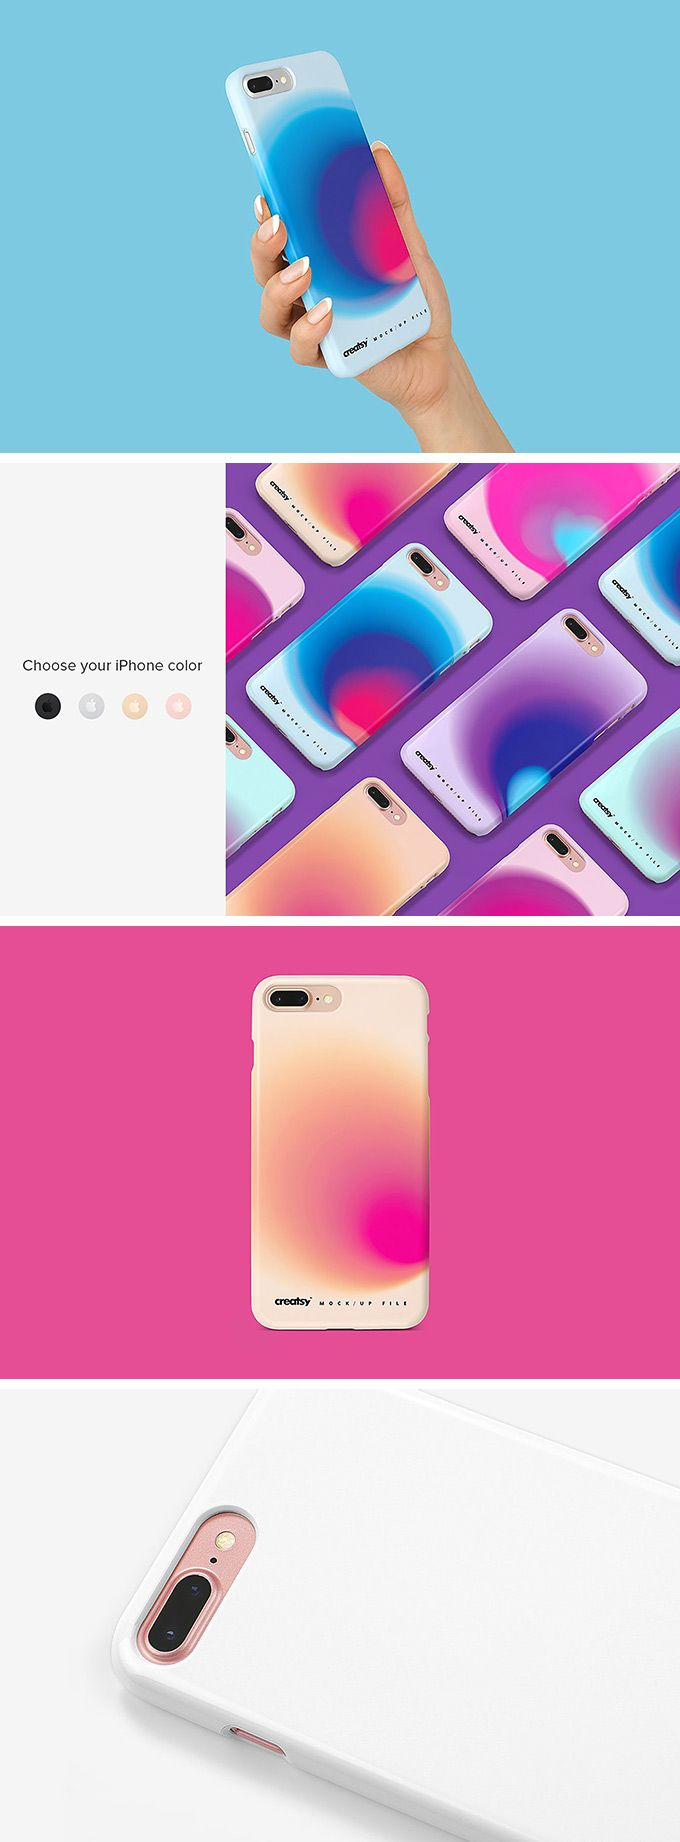 Free Iphone 8 Case Mockup Set Download Psd Template Iphone Desain Iphone 6